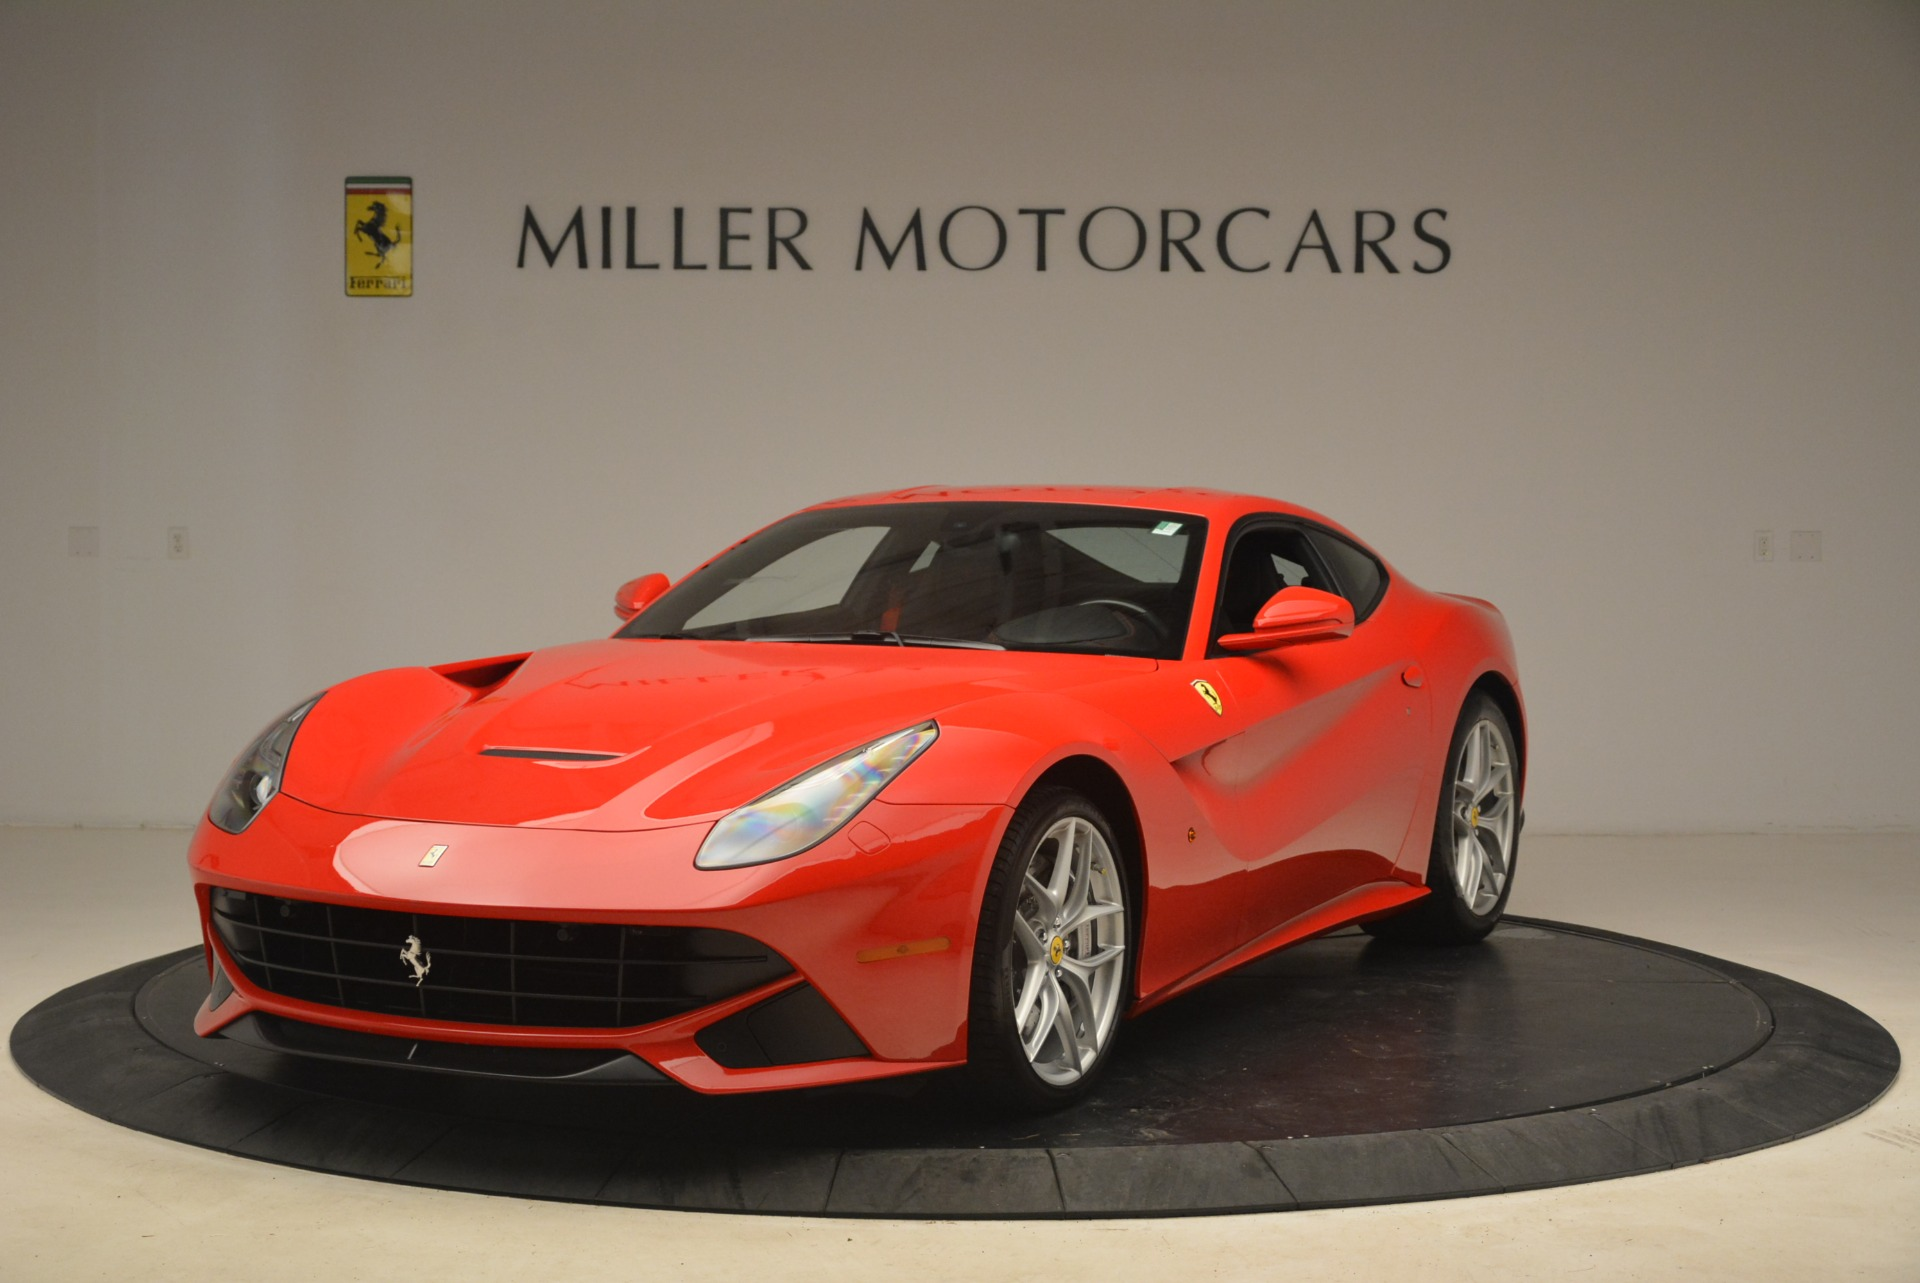 Used 2014 Ferrari F12 Berlinetta for sale Sold at McLaren Greenwich in Greenwich CT 06830 1